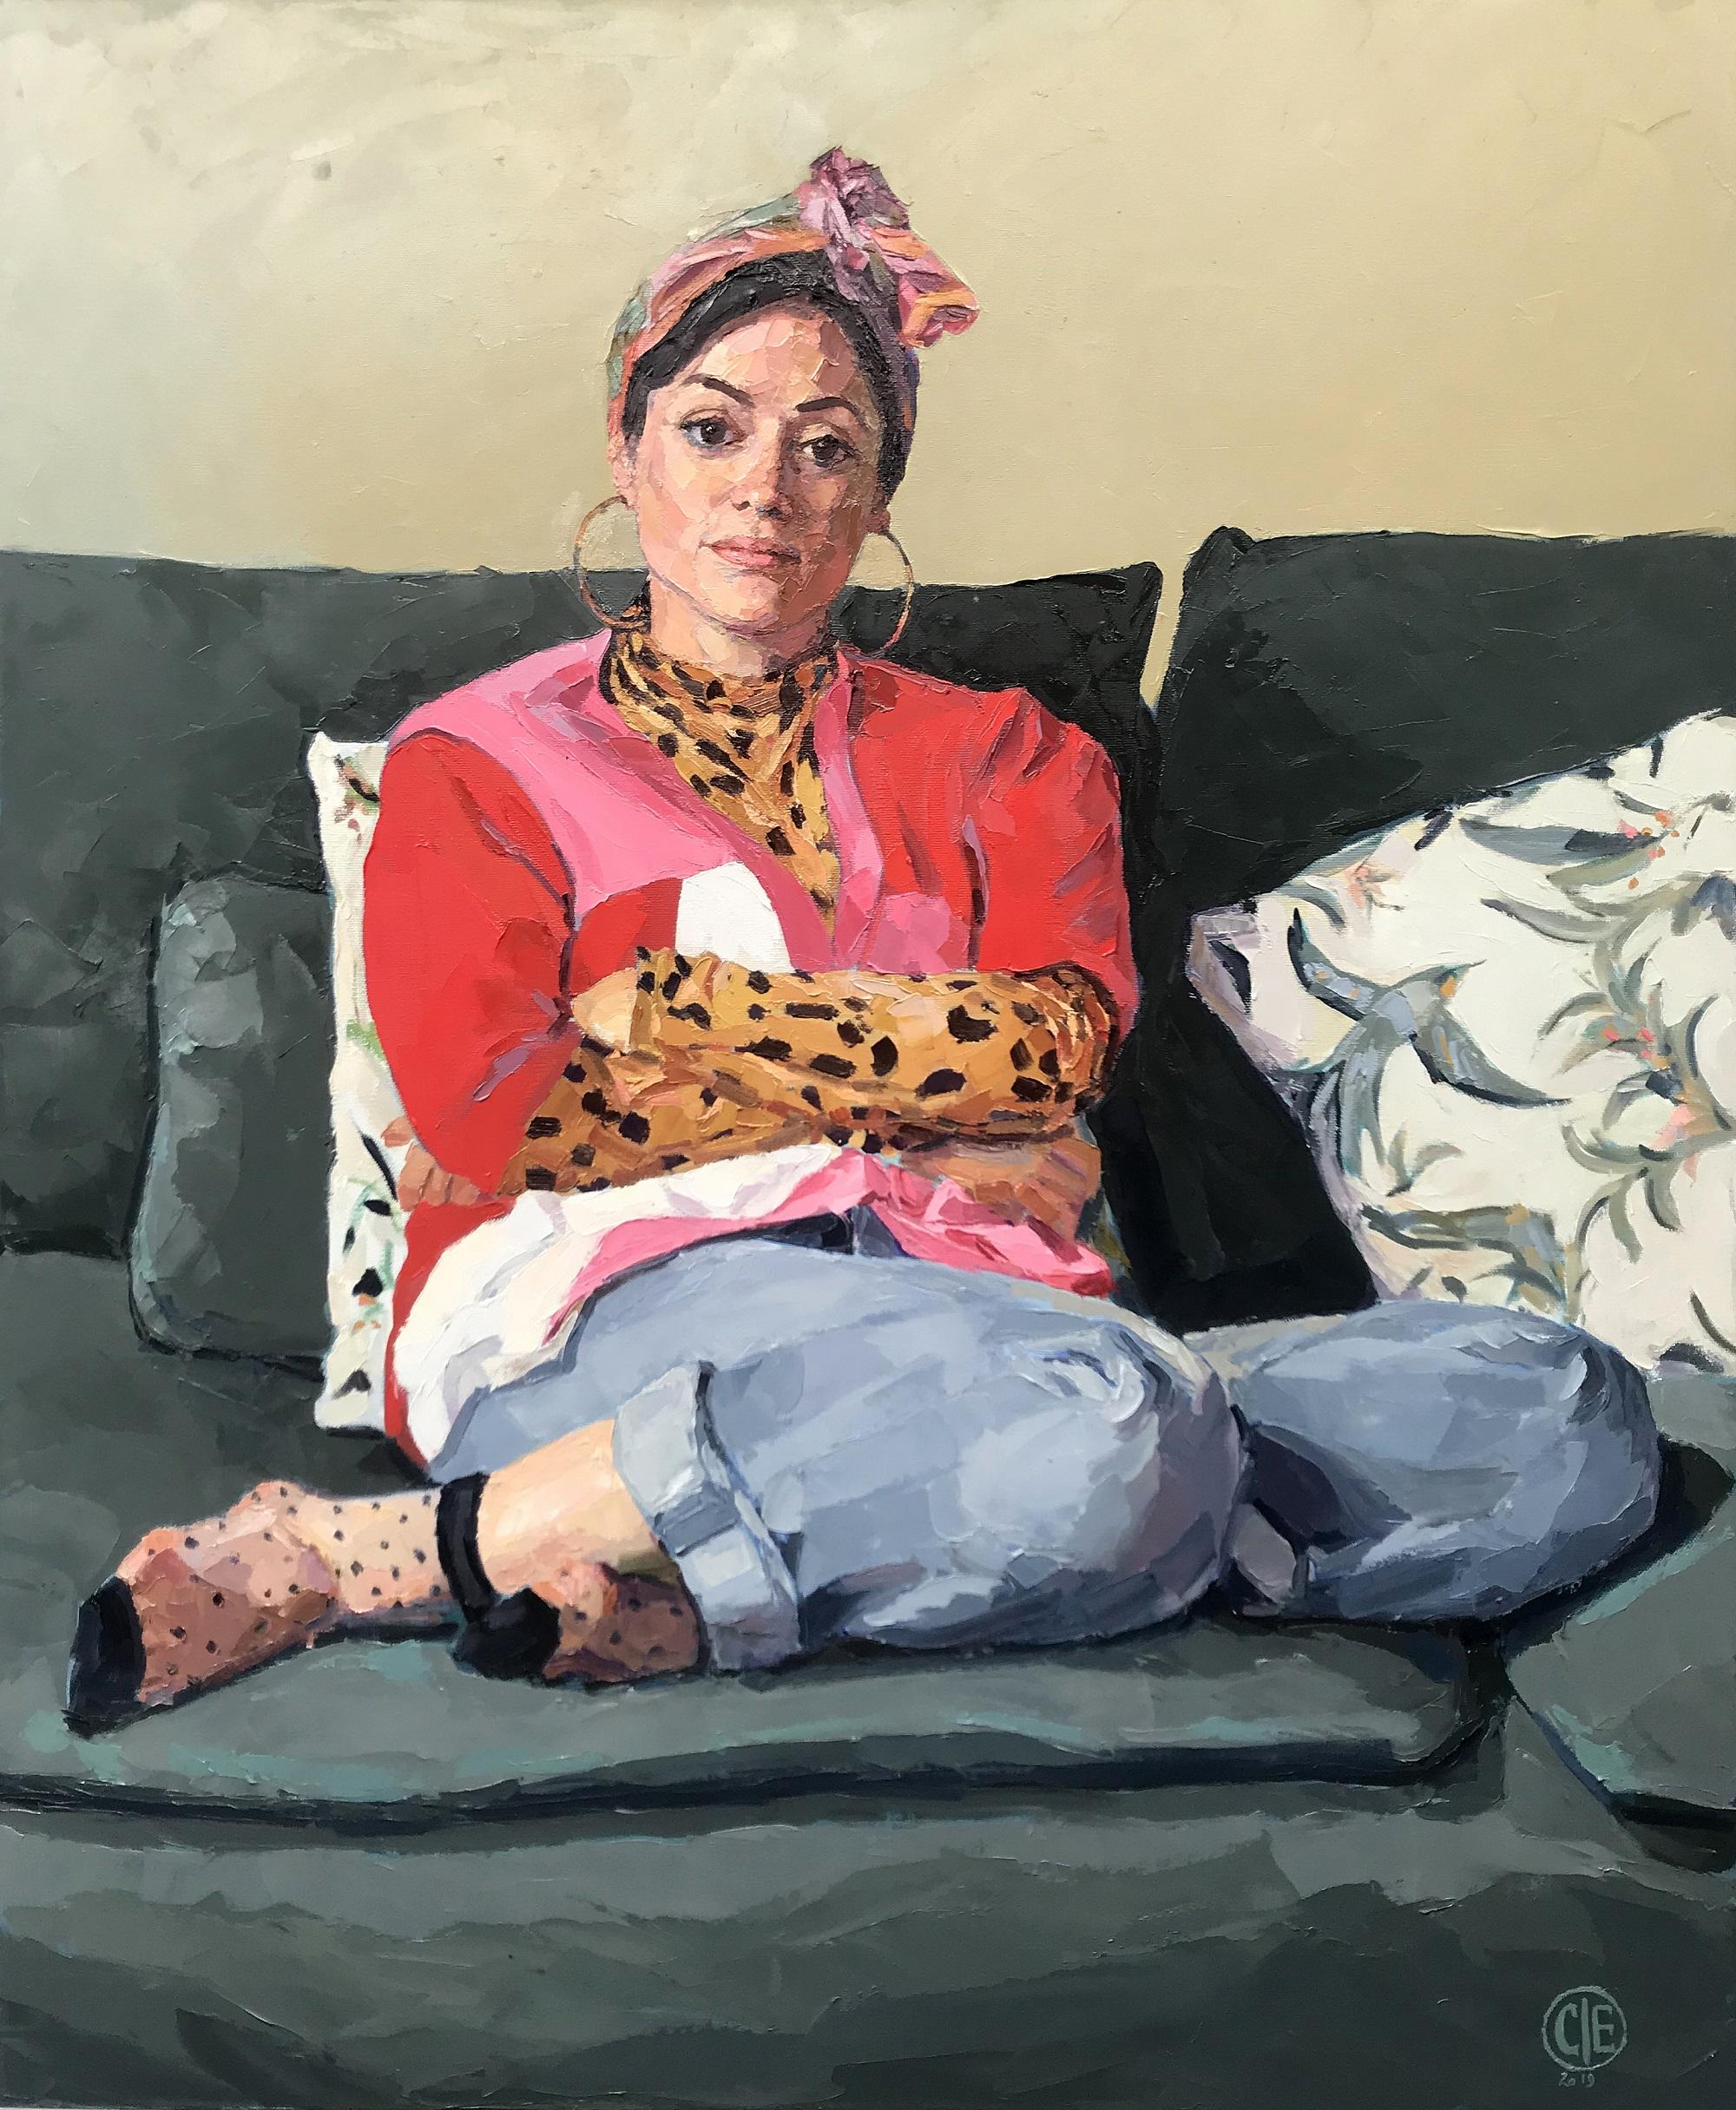 Sabrina Mahfouz Clae Eastgate Oil on canvas, 30 x 36 in.